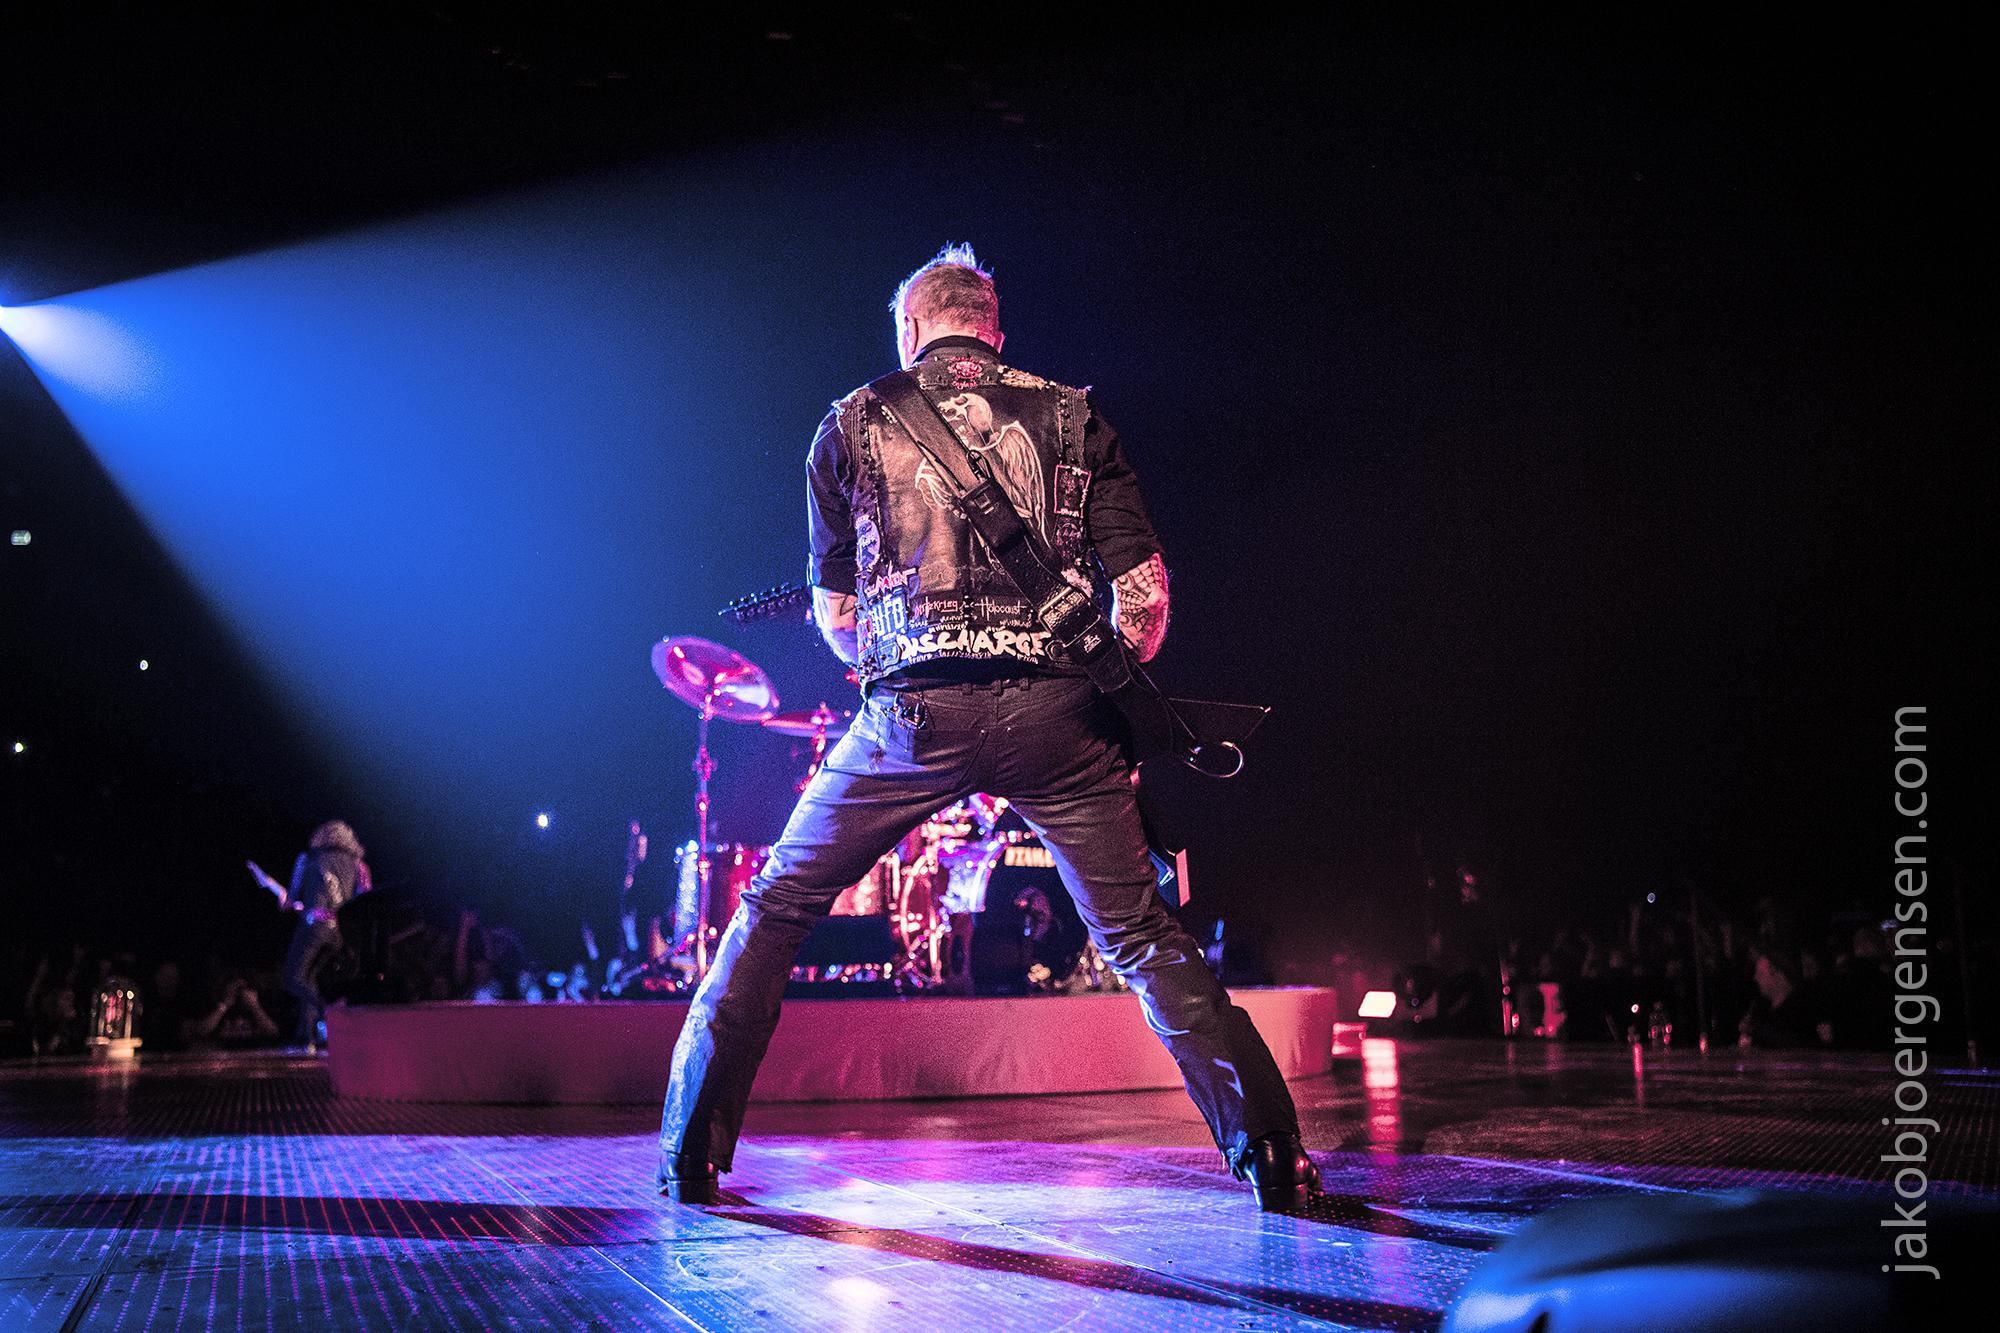 09-02-17_EB Metallica_0084.jpg